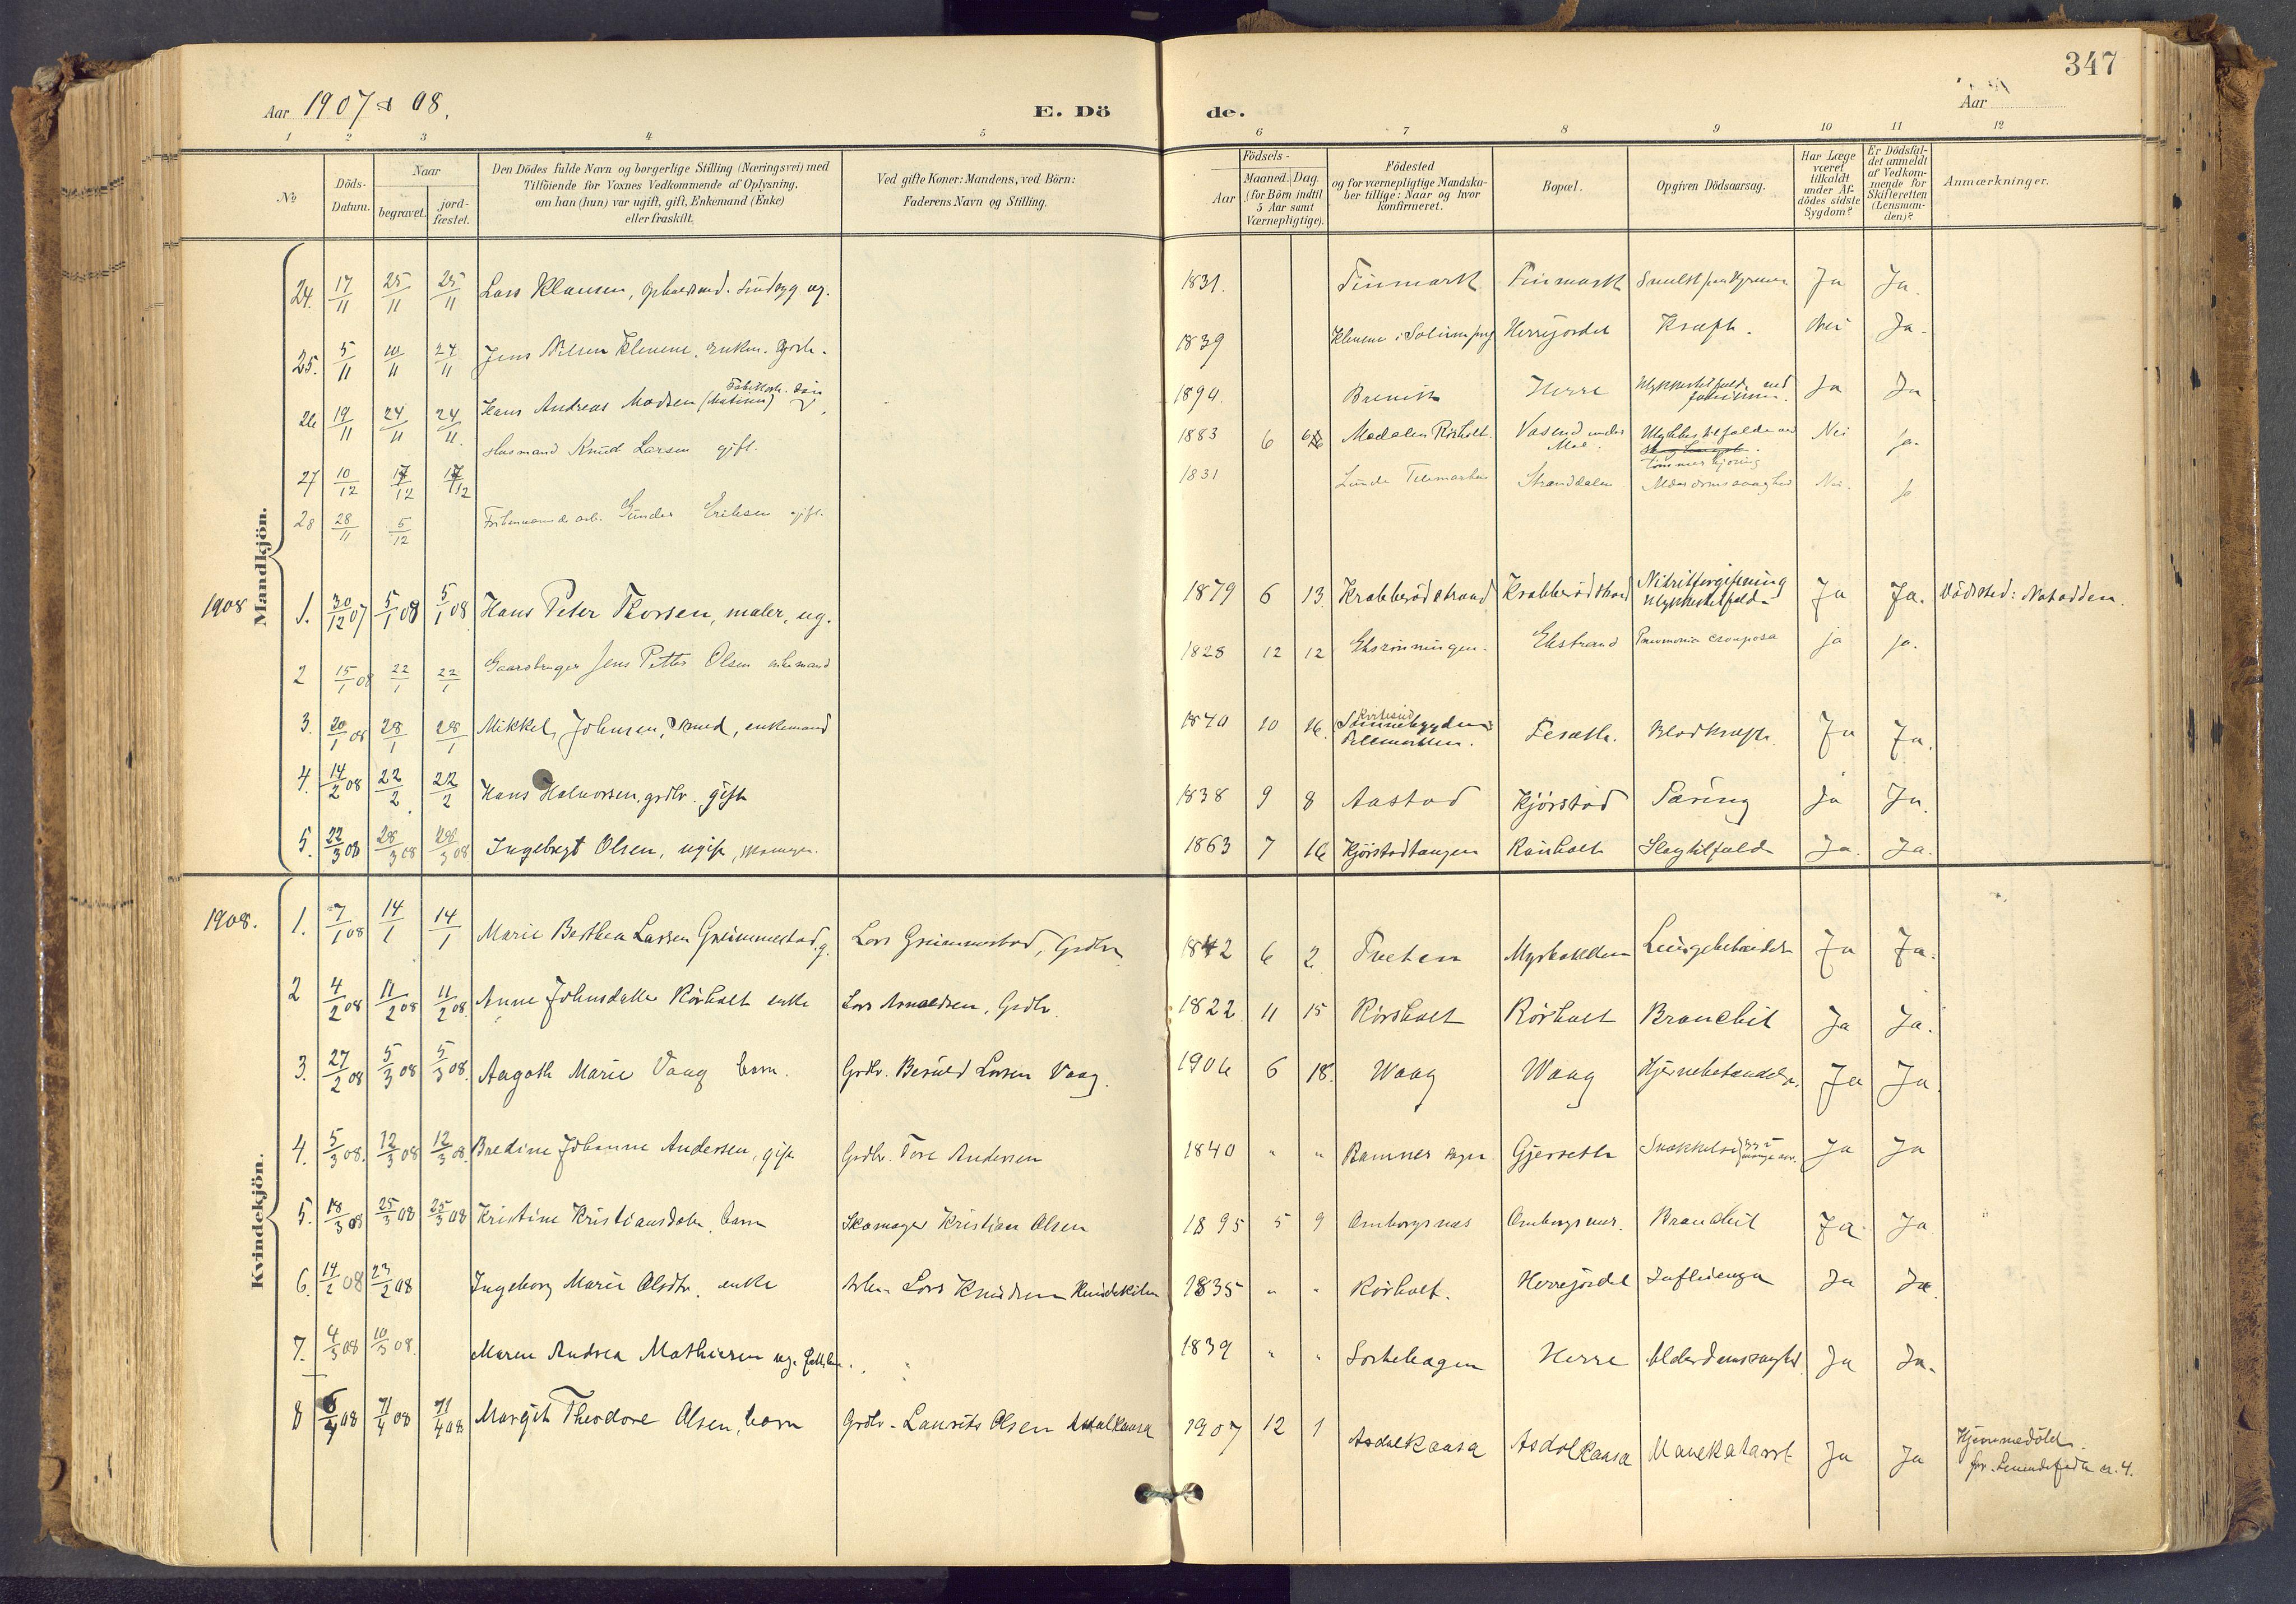 SAKO, Bamble kirkebøker, F/Fa/L0009: Ministerialbok nr. I 9, 1901-1917, s. 347